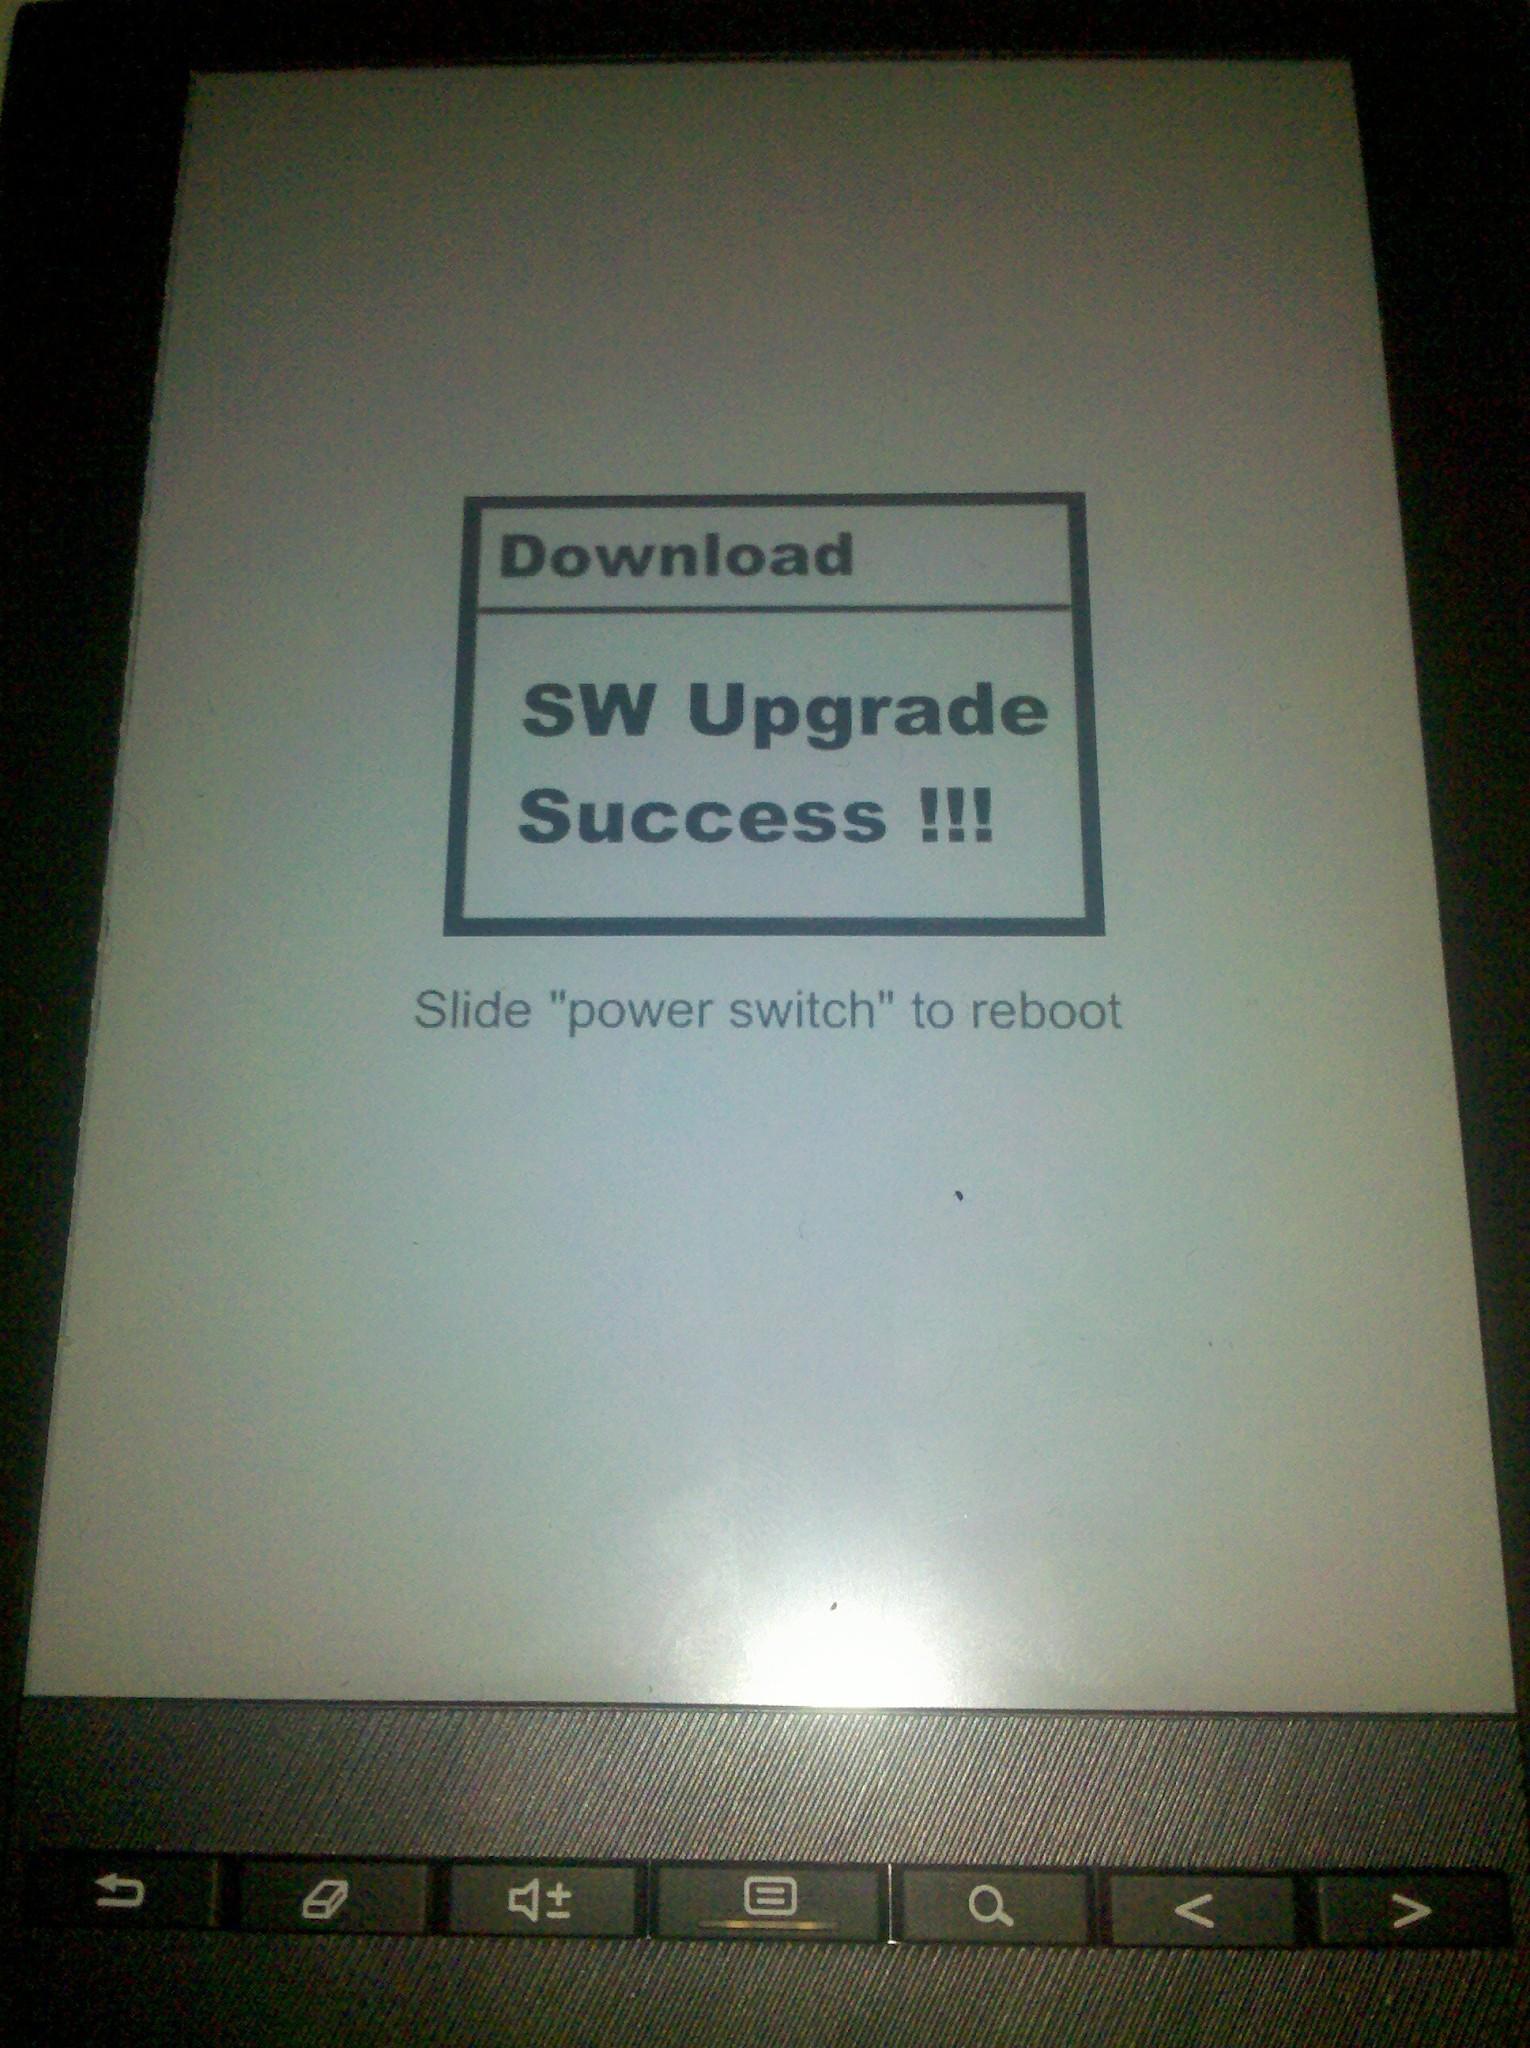 Positivo alfa tips tricks hacks bricks rodrigo rodrigues info img20101225000006g img20101225000013g fandeluxe Images